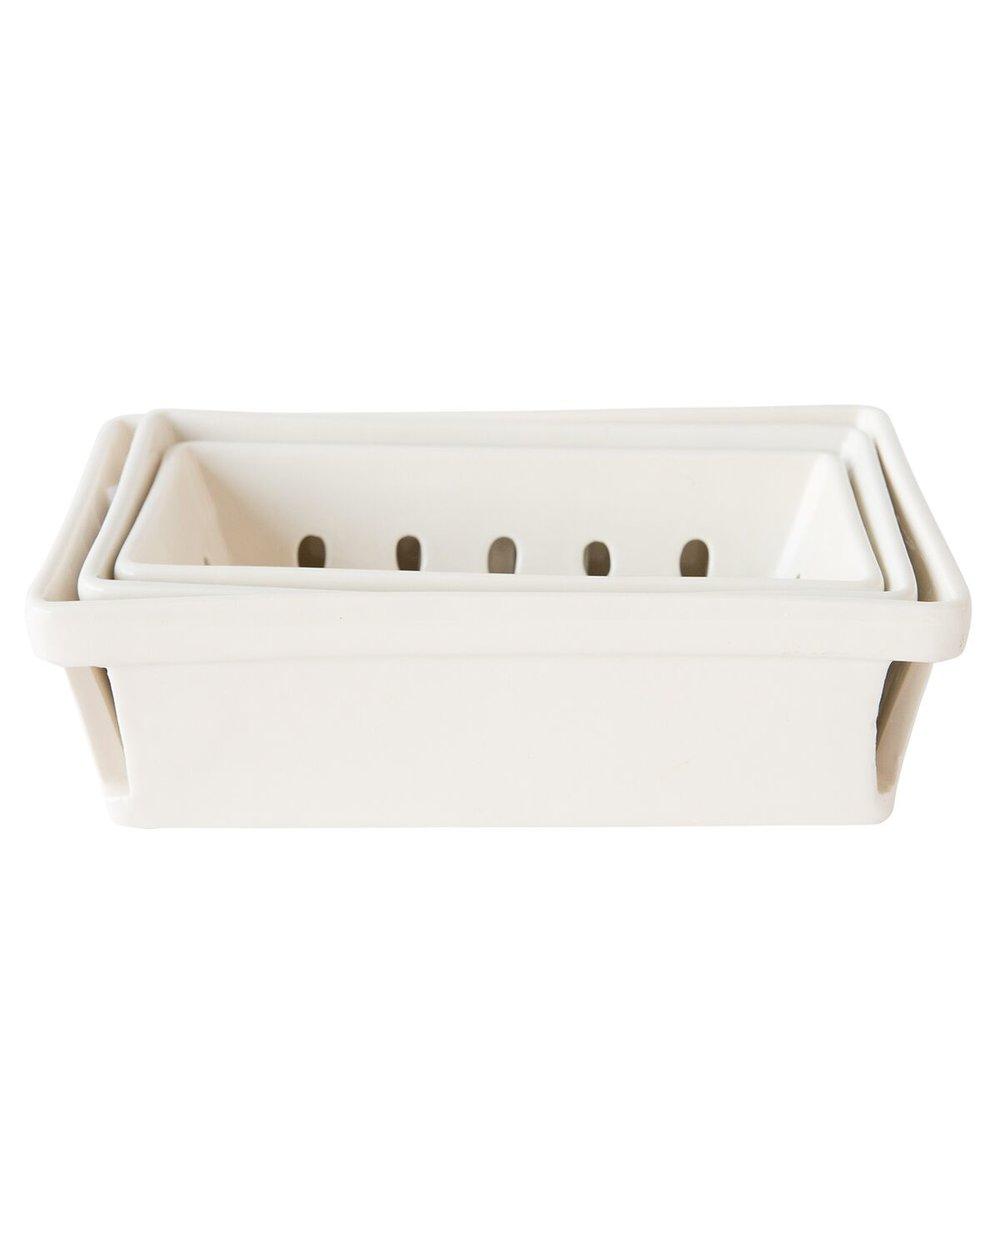 Ceramic Berry Baskets 1_preview.jpg